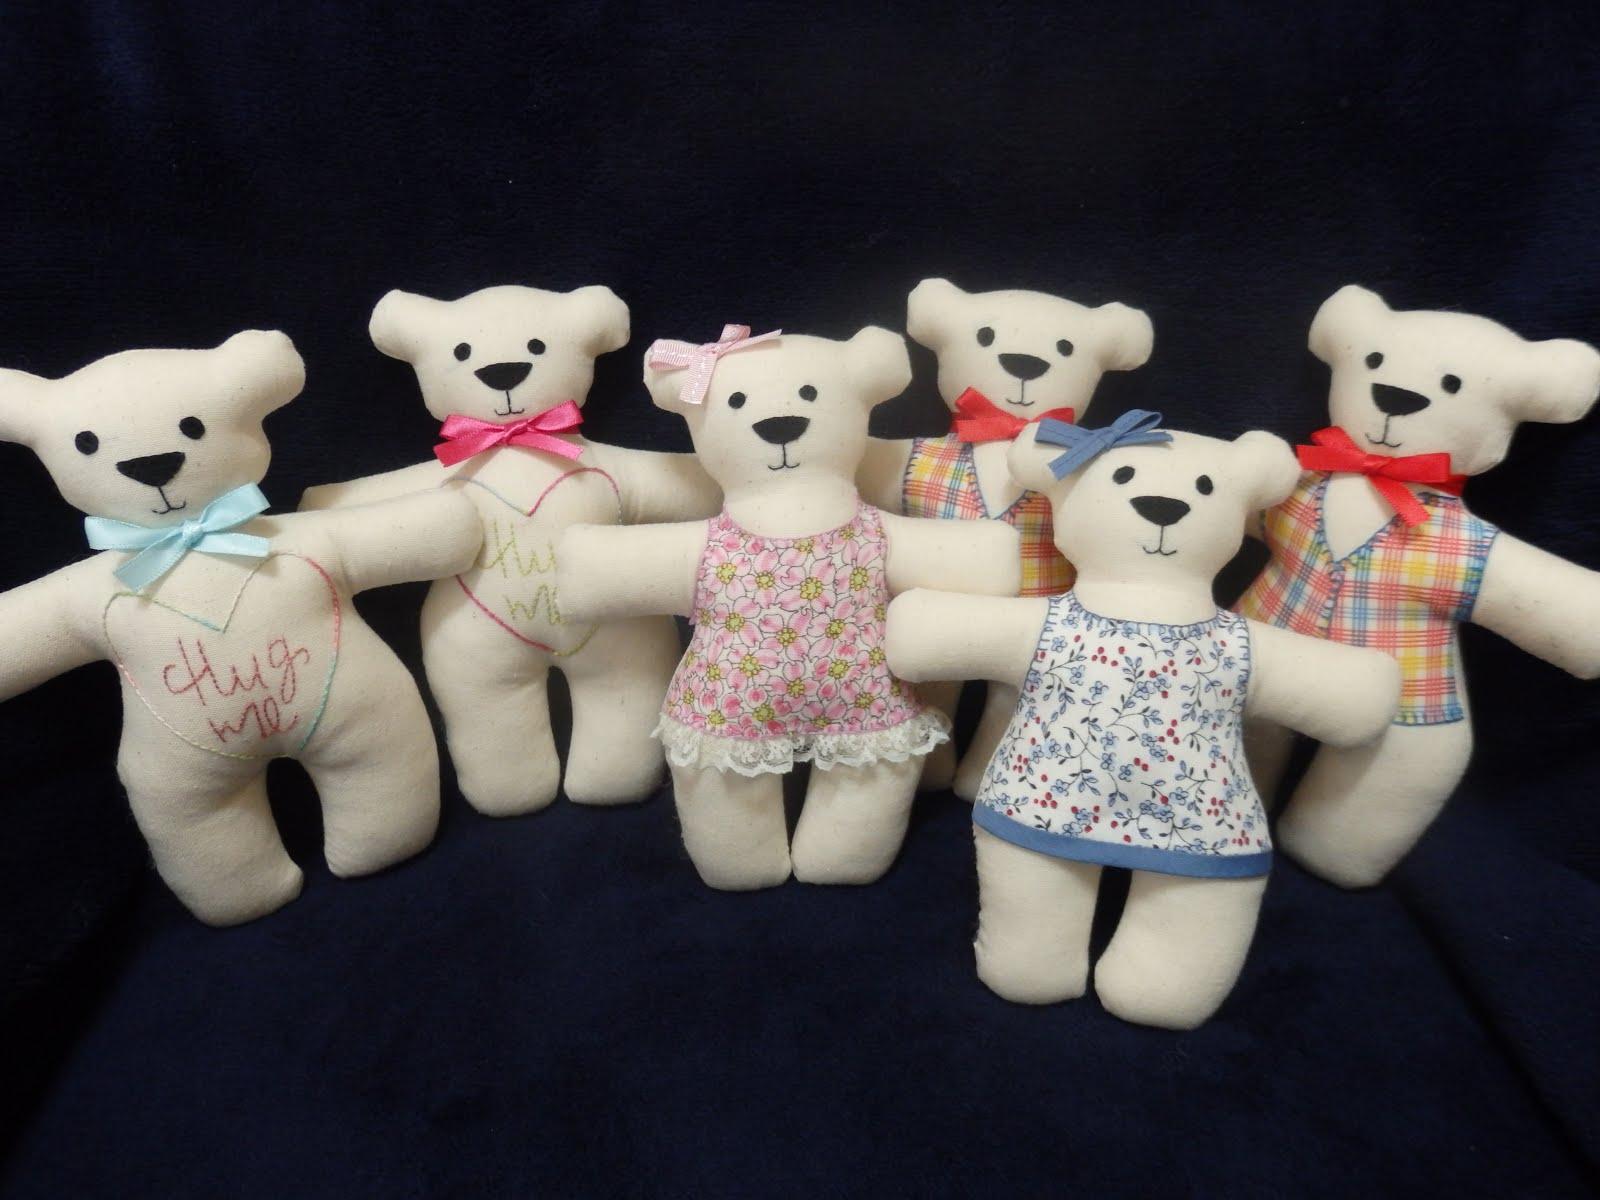 AMEA Randem Act of Kindness Bears - spreading love one bear at a time